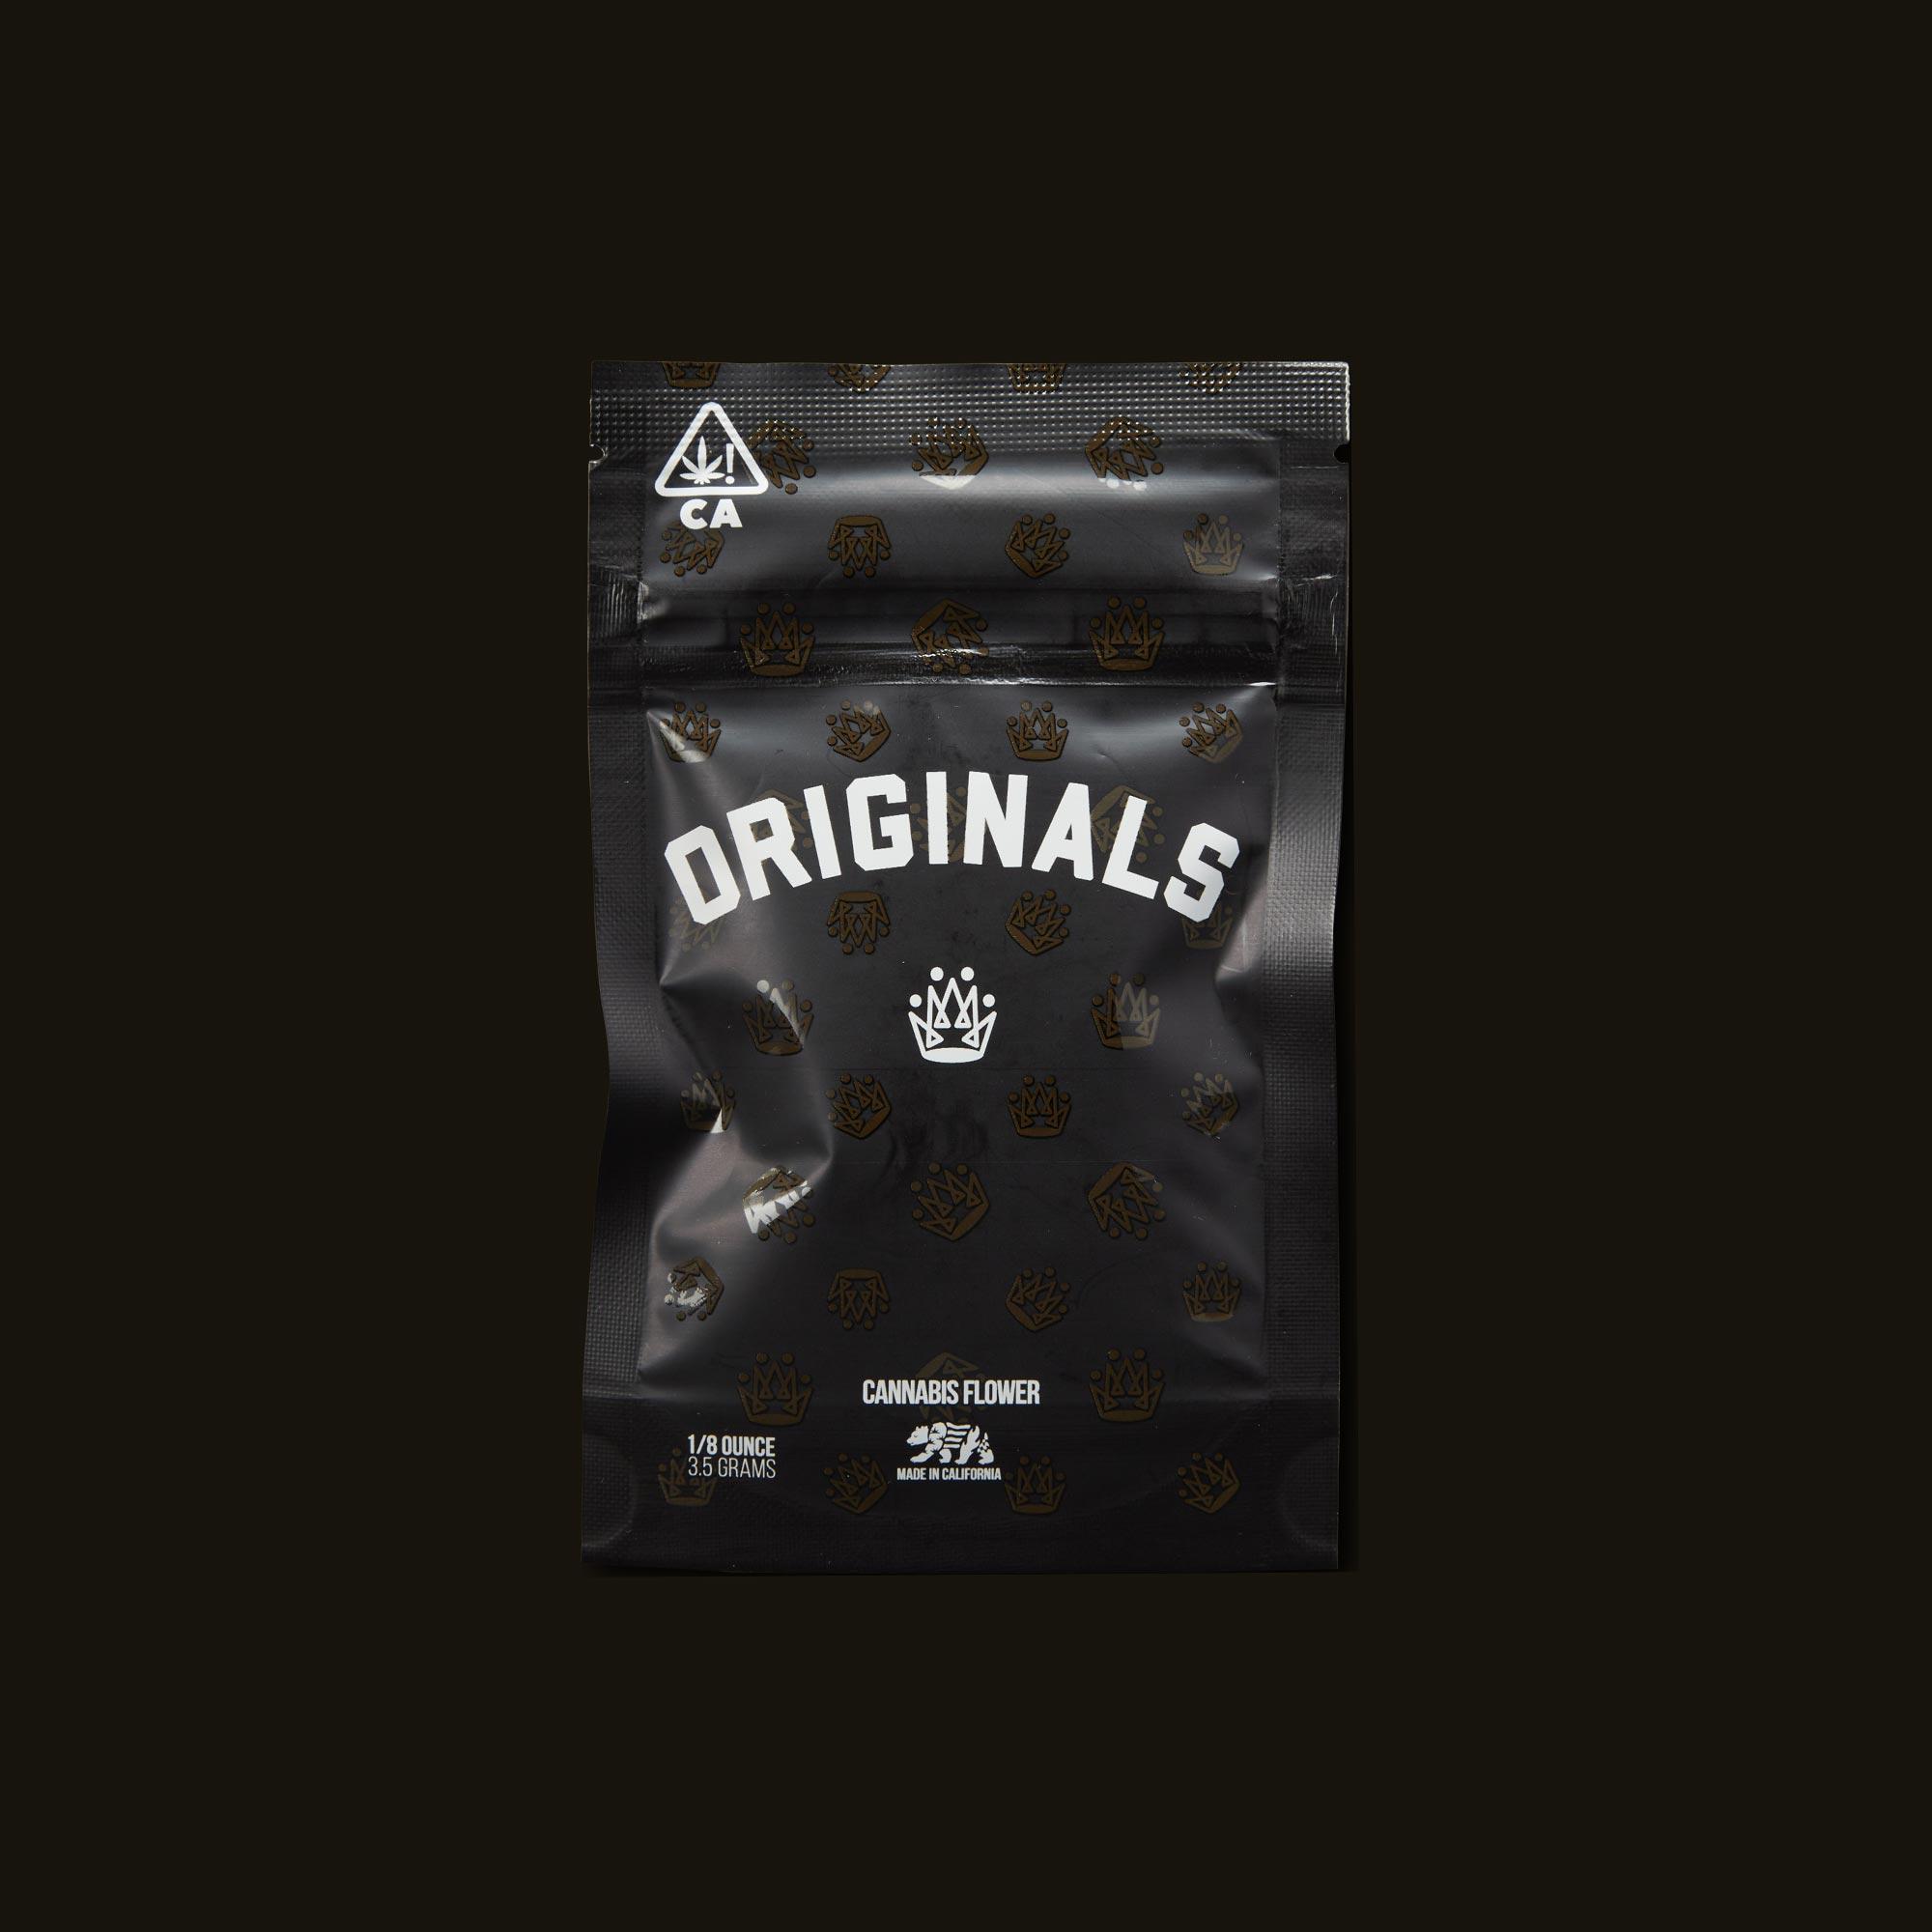 Originals OG S010 - 1/8oz